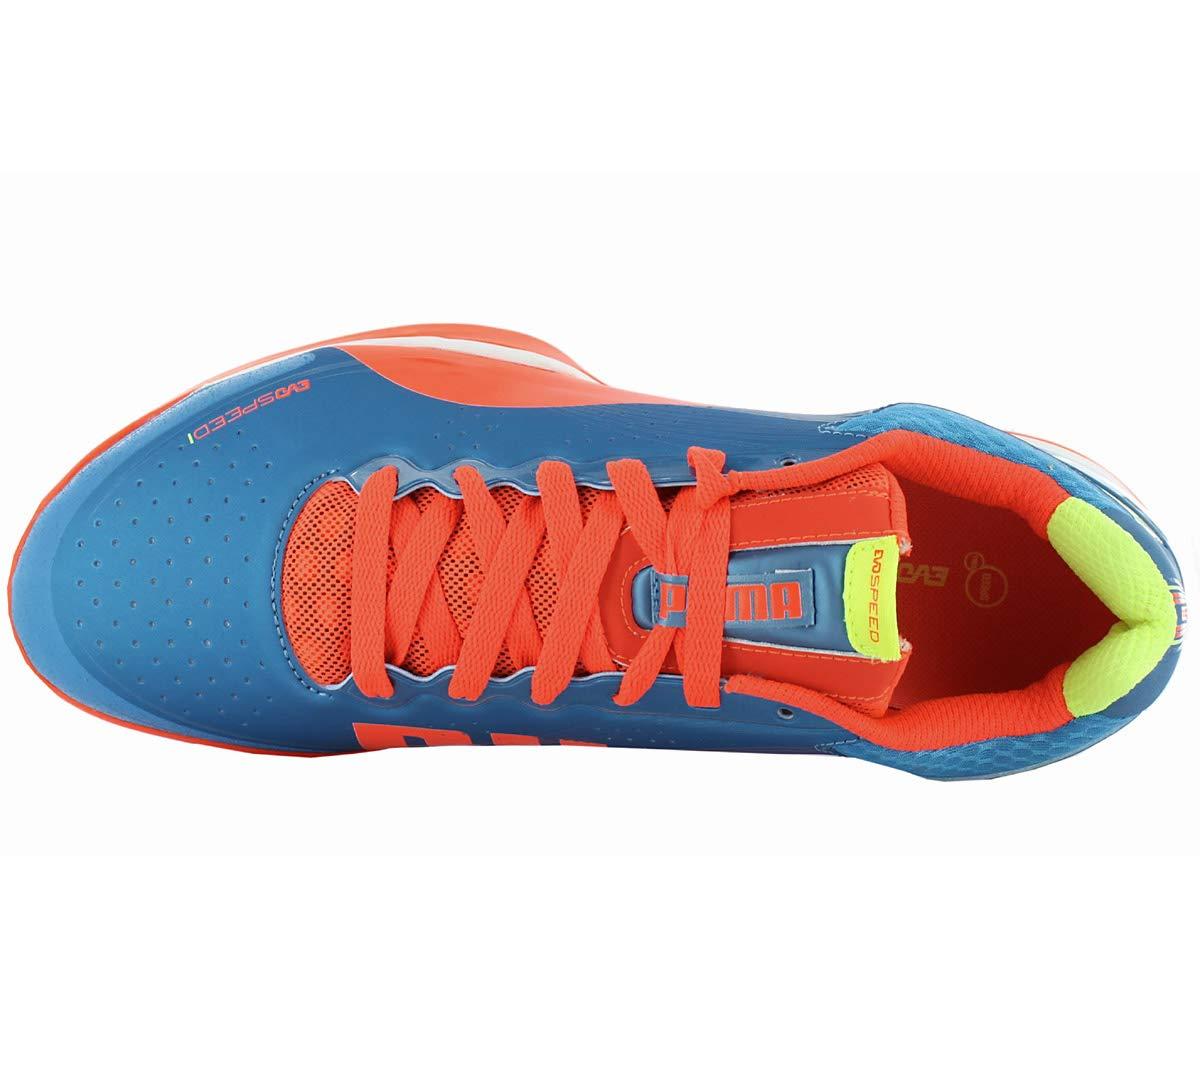 1 Evospeed Indoor 2 Handball Puma Chaussures 102850 De Ag z1WfnEaUq